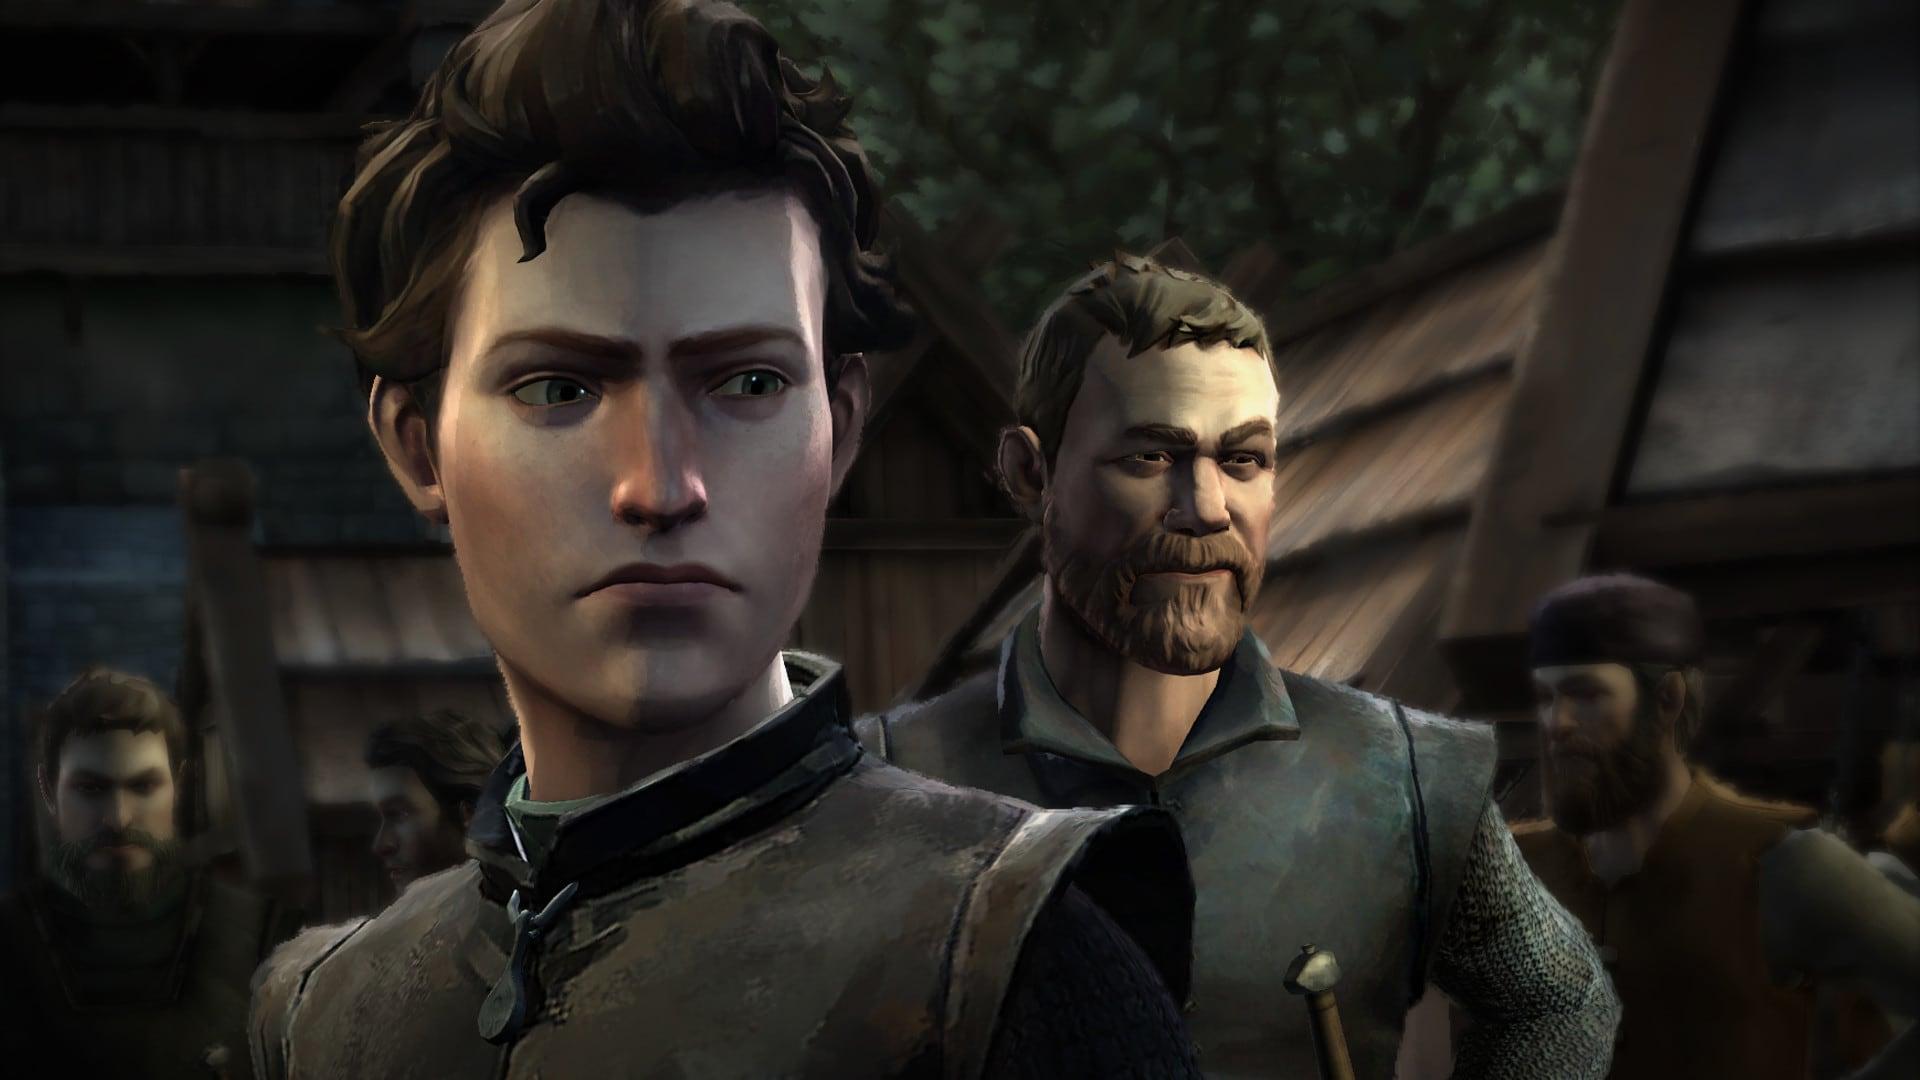 Juego de Tronos - A Telltale Games Series